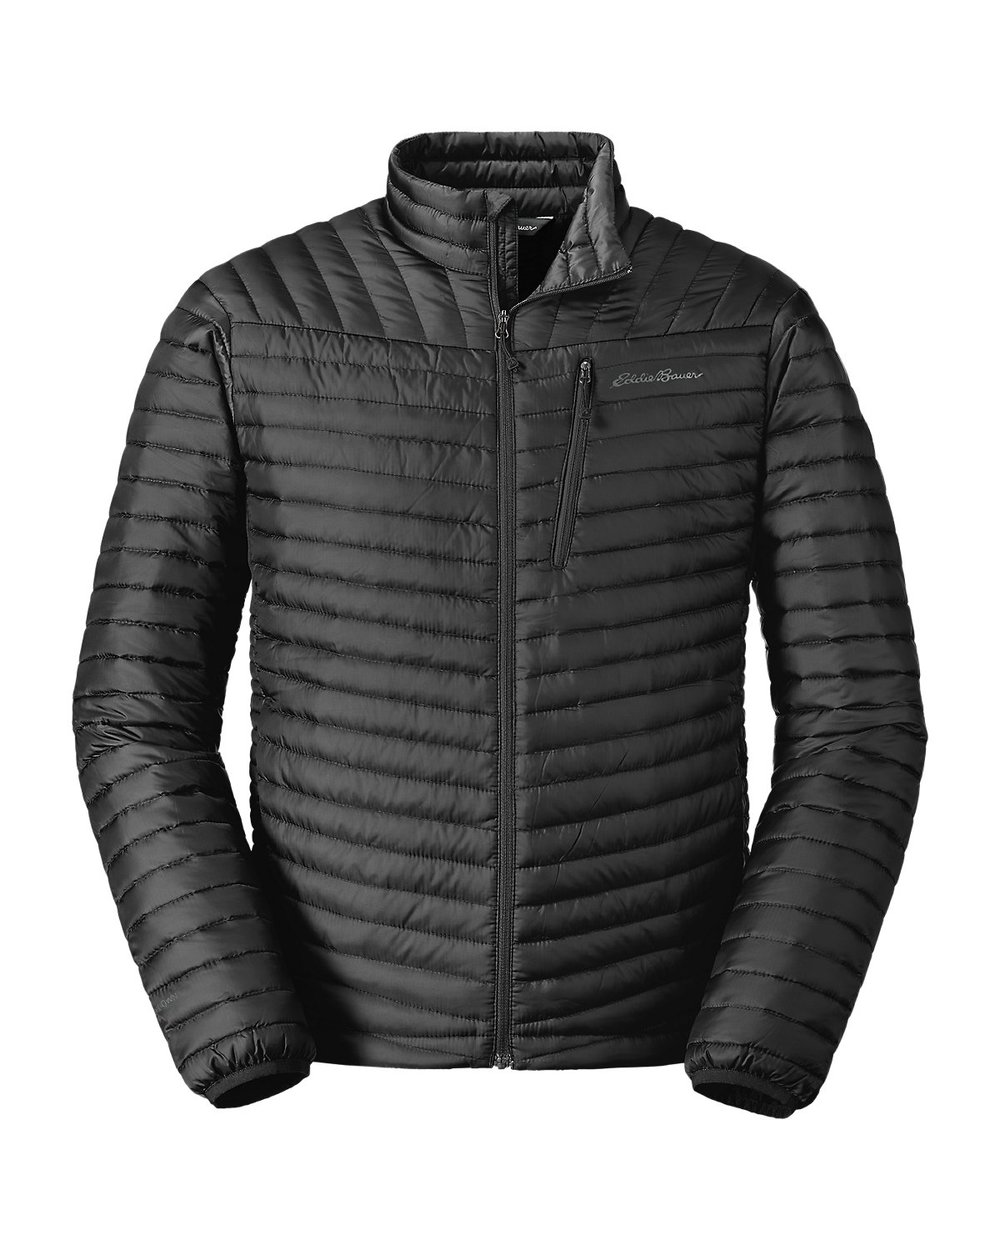 Microtherm Jacket